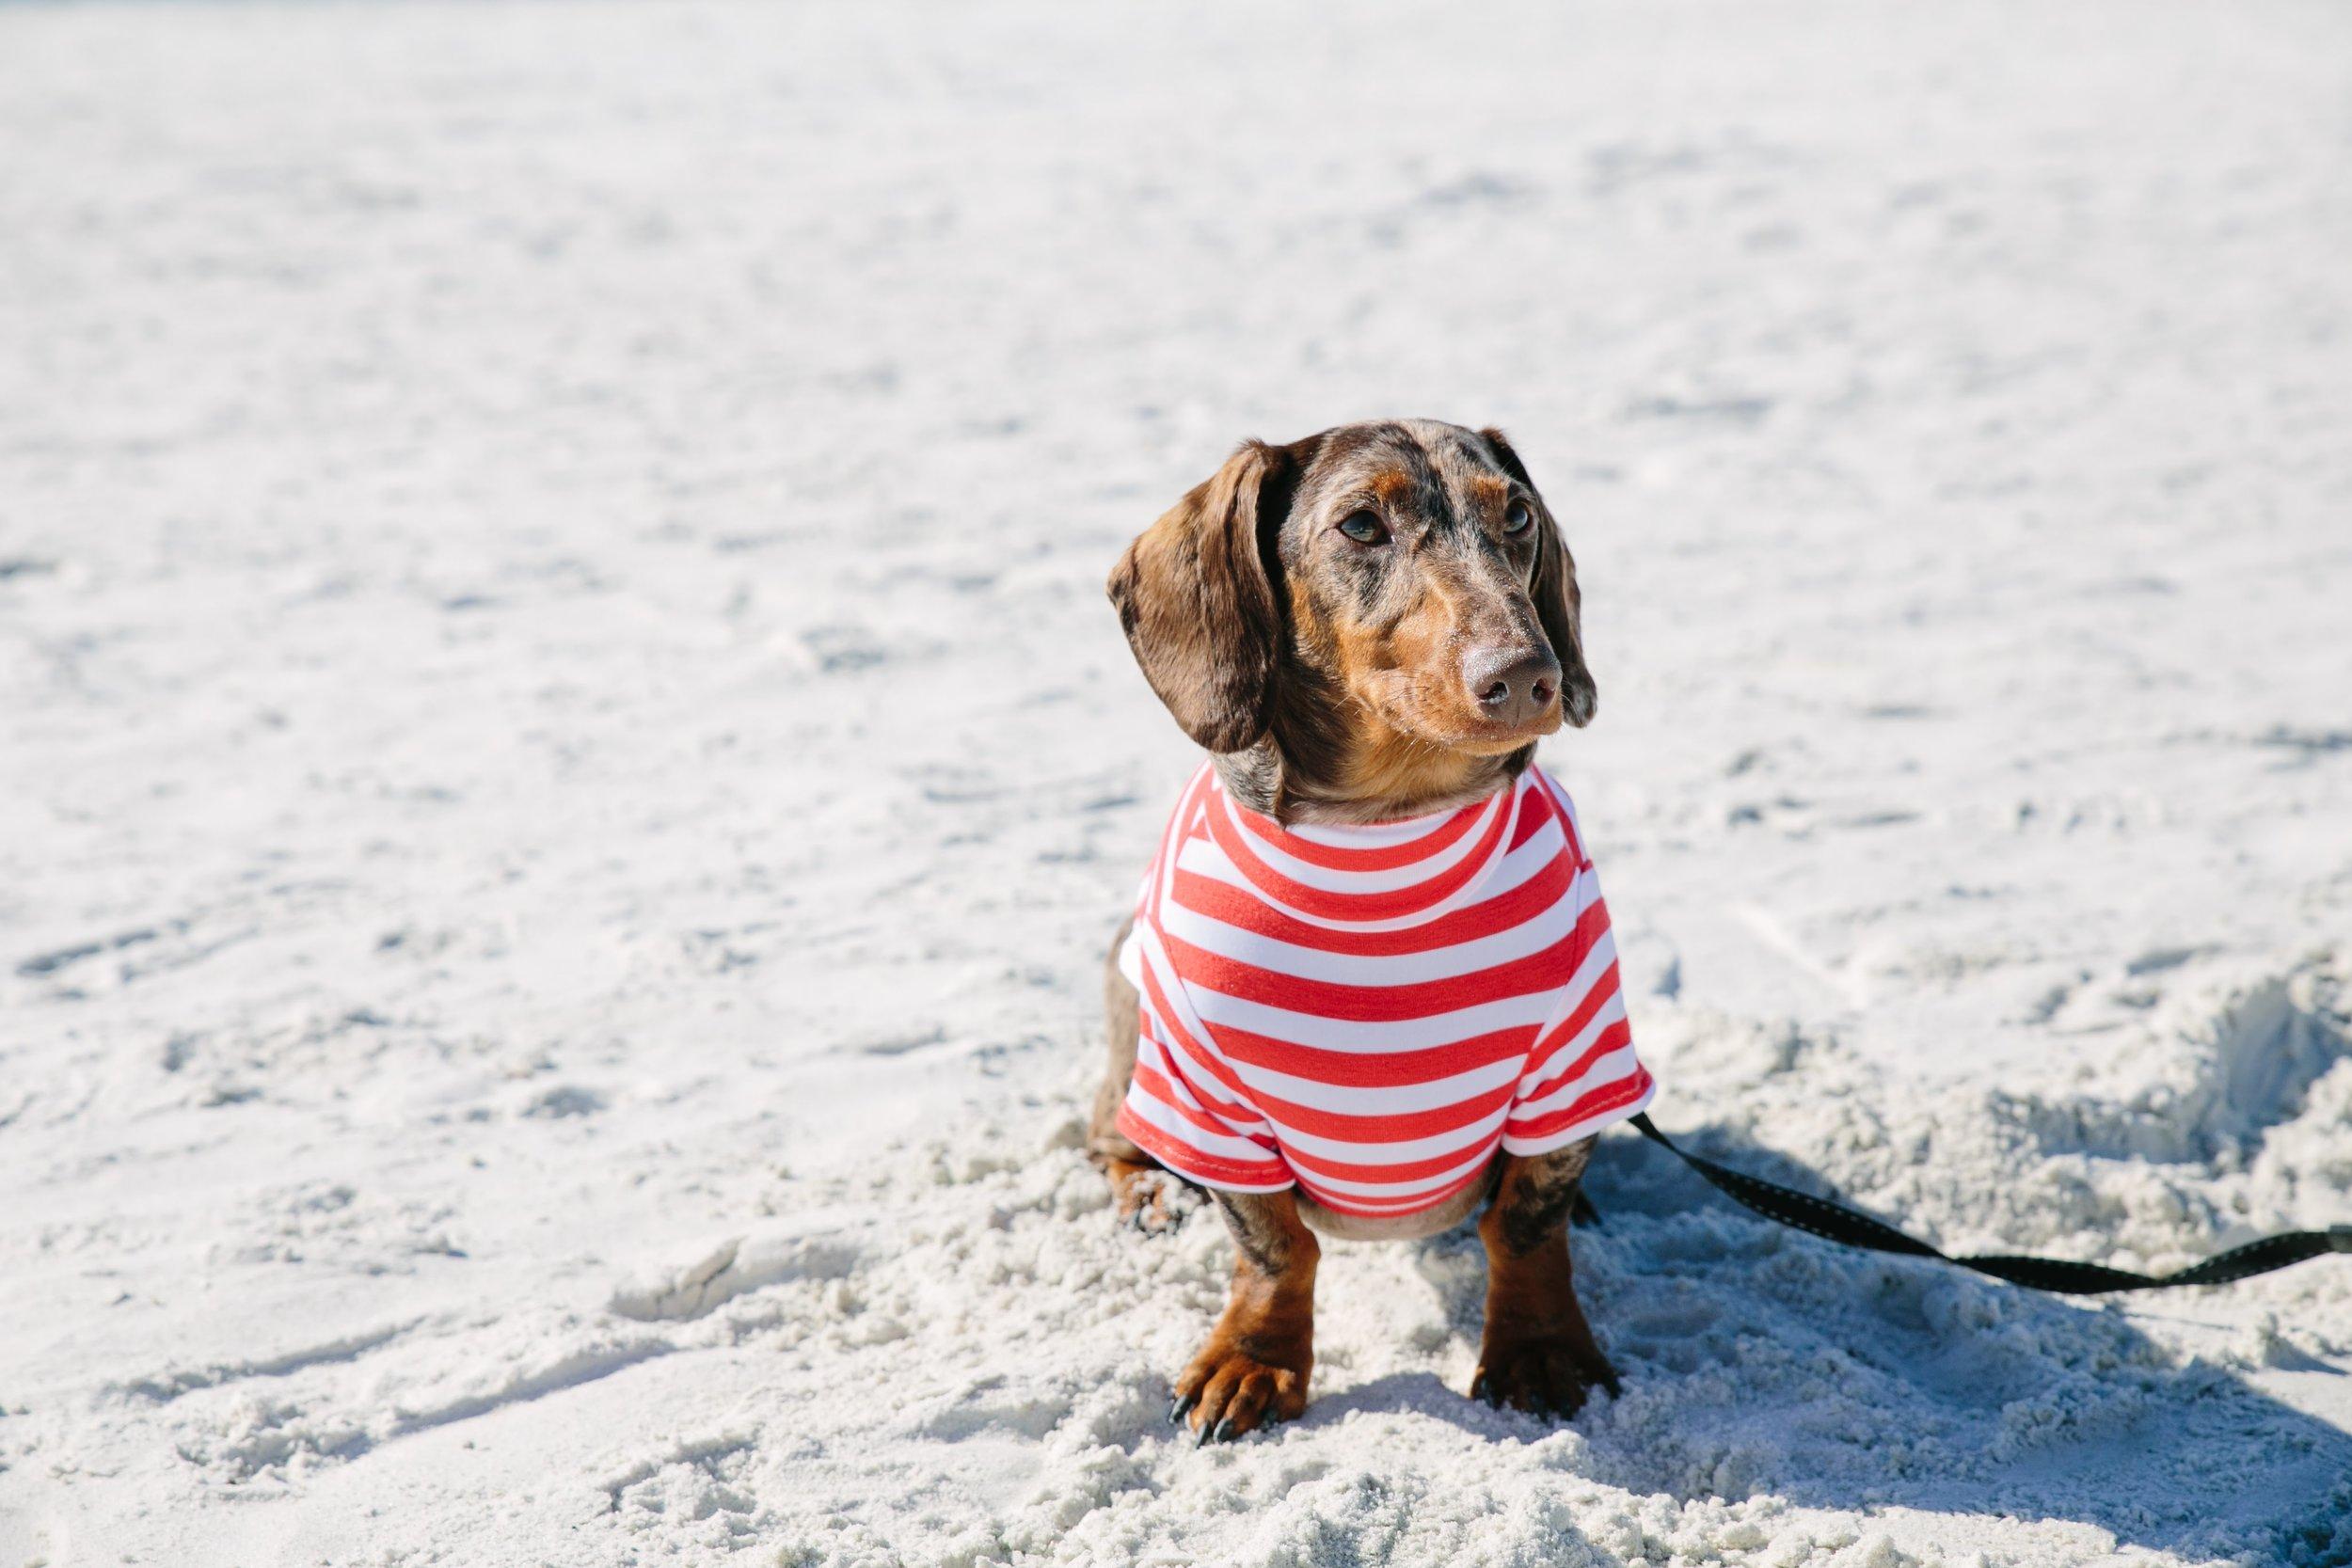 Rocking some nautical stripes on the beach